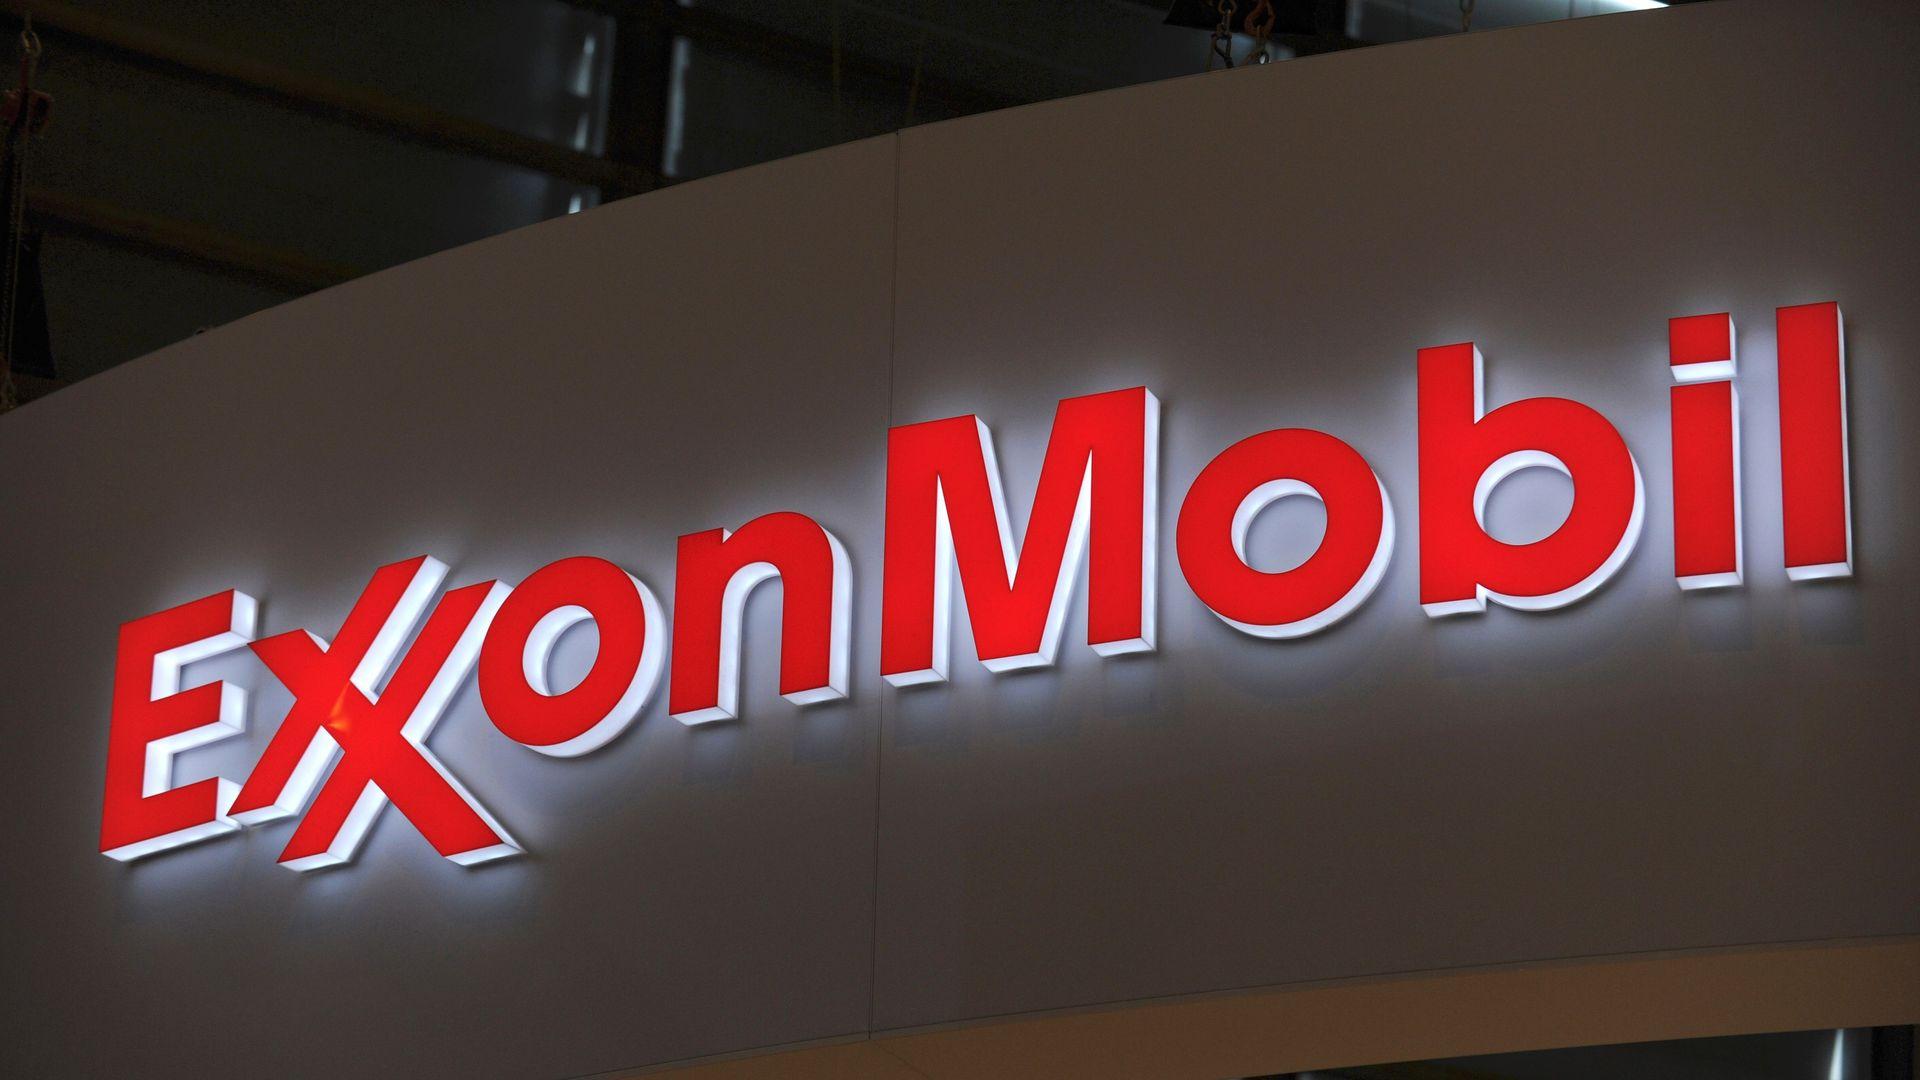 ExxonMobil sign lit up at night